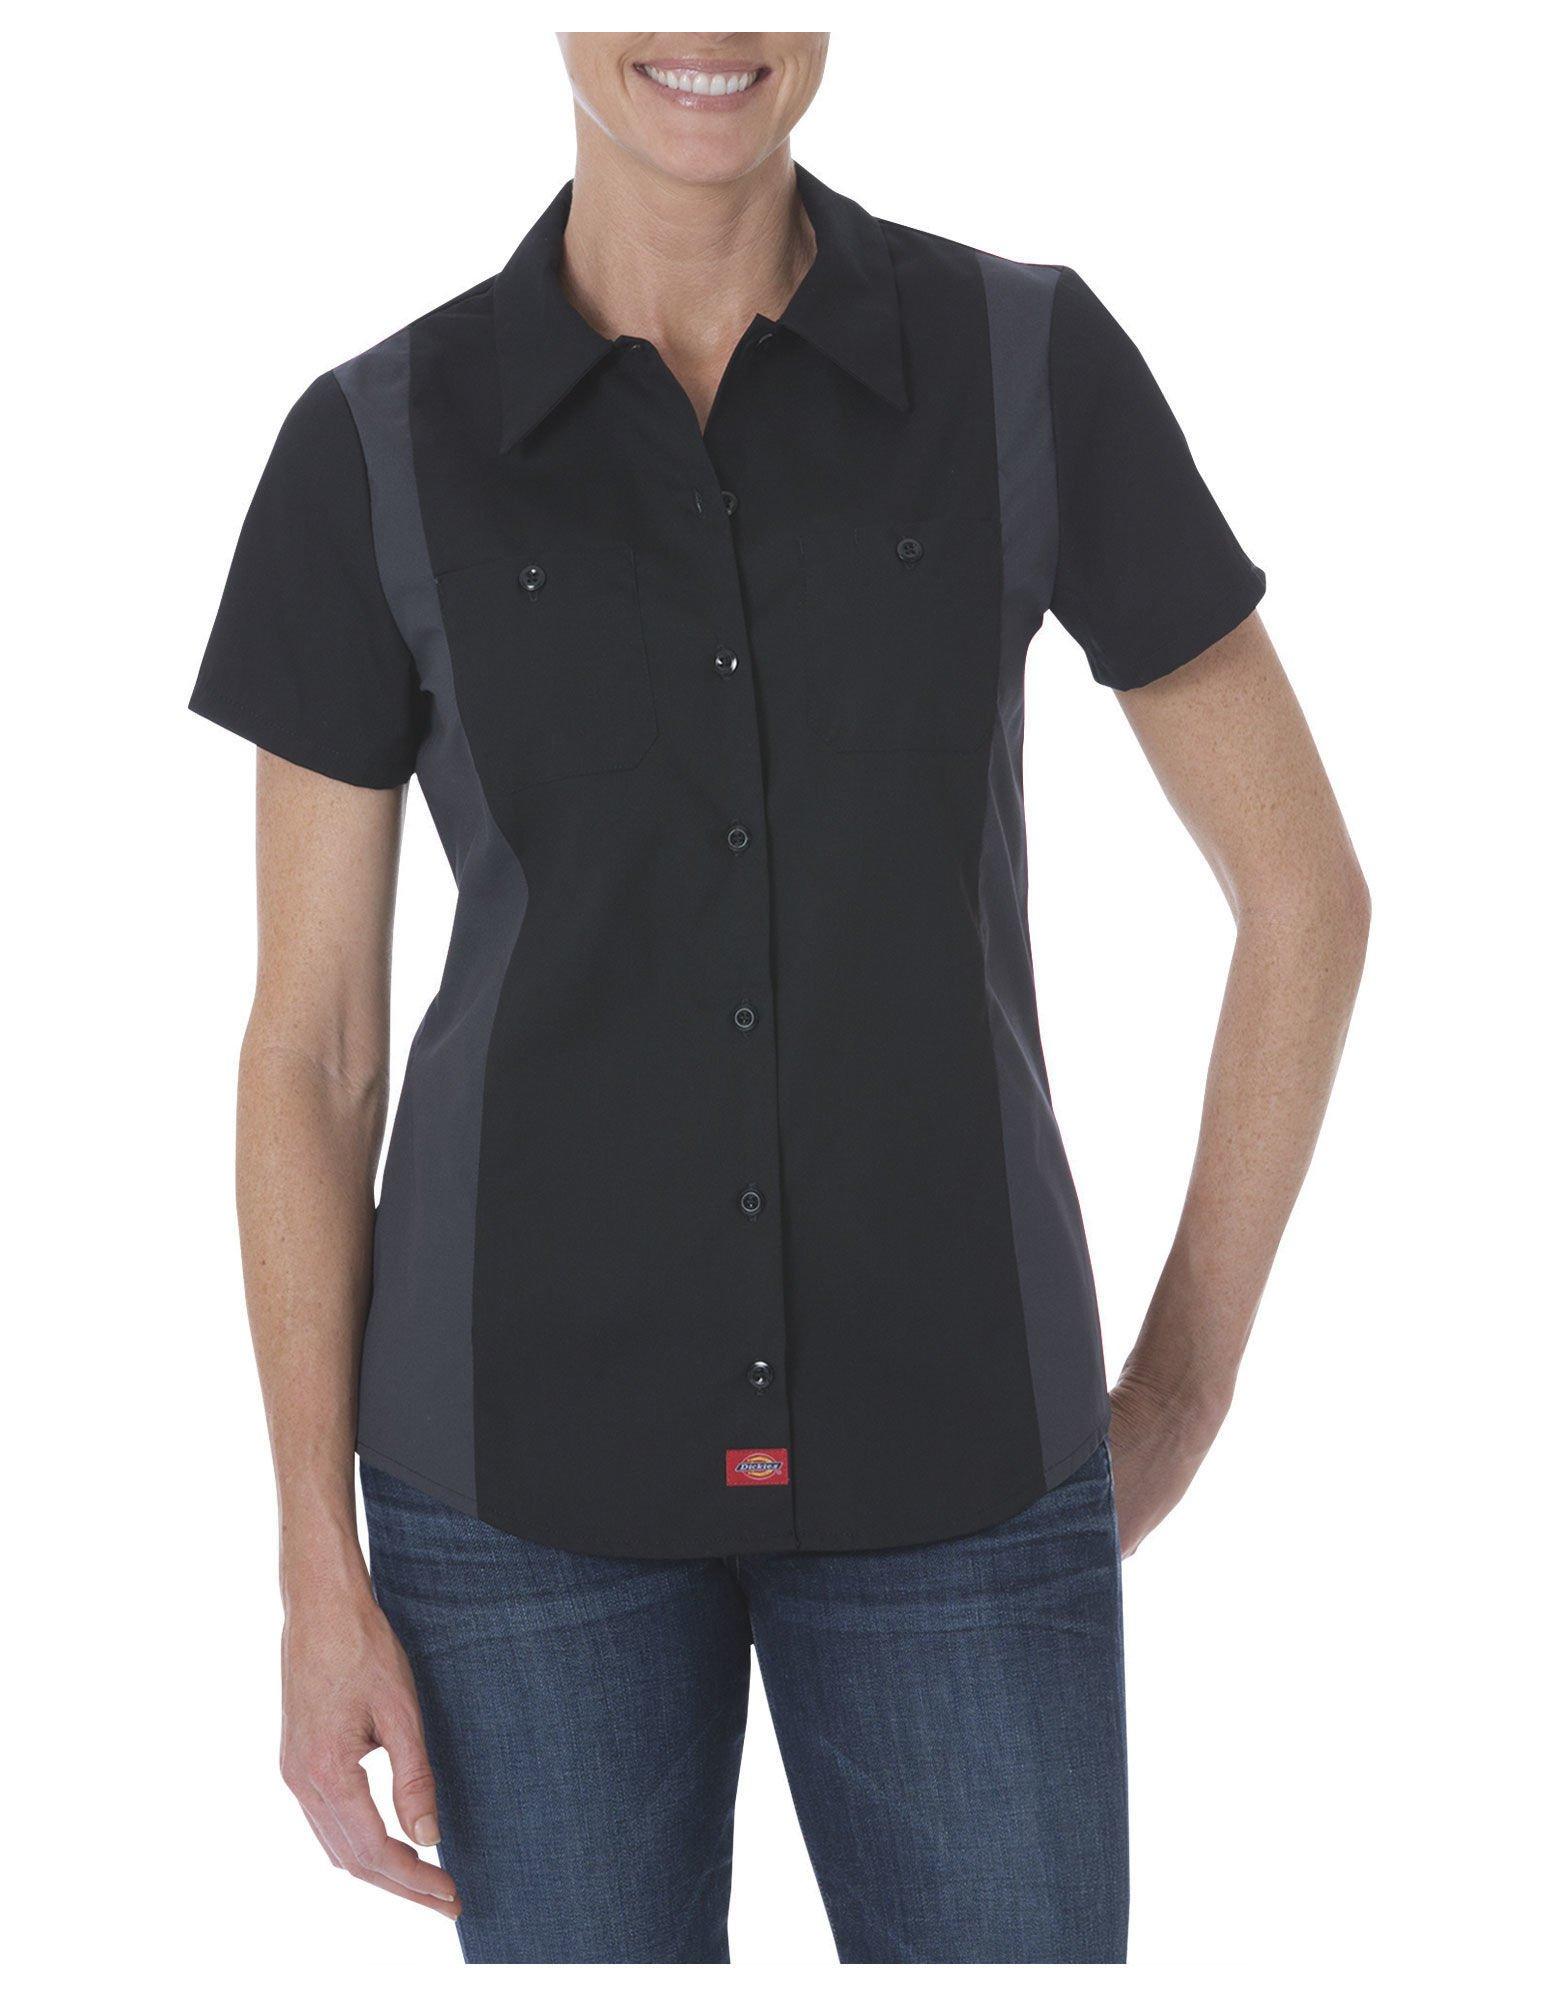 Dickies Occupational Workwear FS524BKCHS FS524 Women's Short Sleeve Color Block Shirt Fabric Small Black/Charcoal